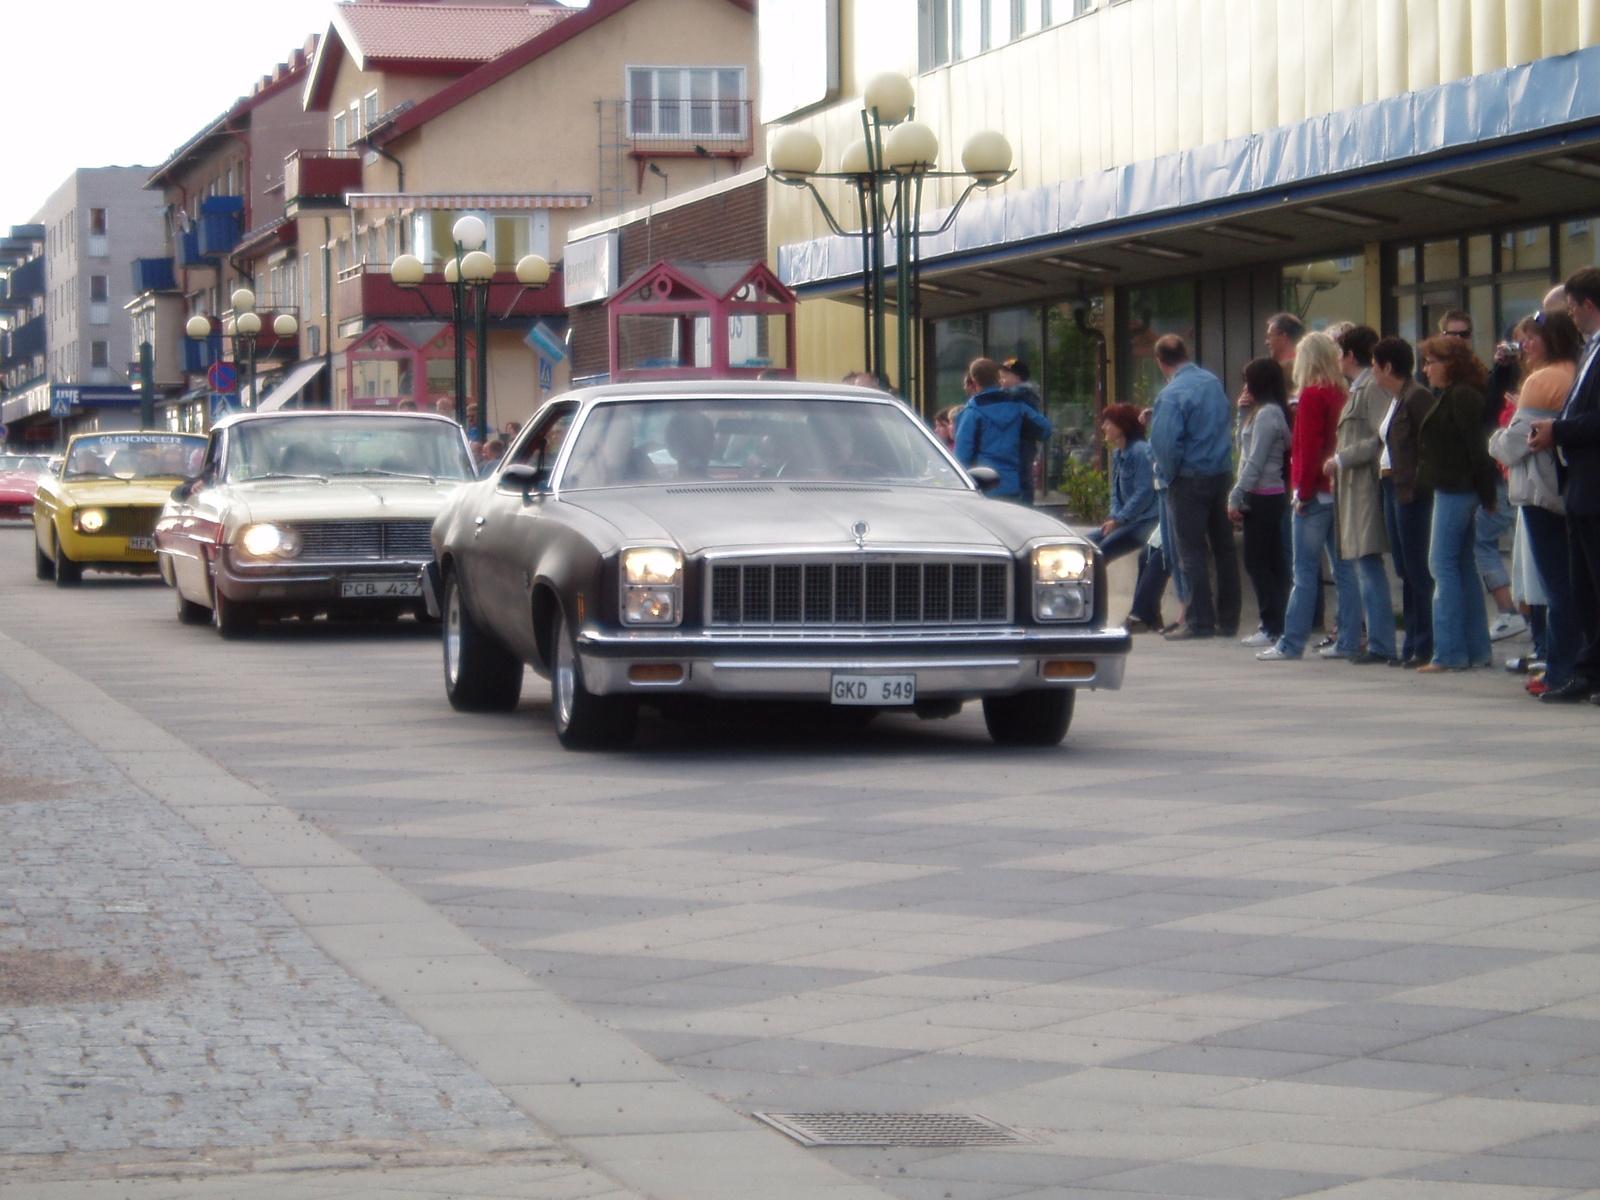 Very Cool Looking Bu  1977-chevrolet-malibu-pic-23440